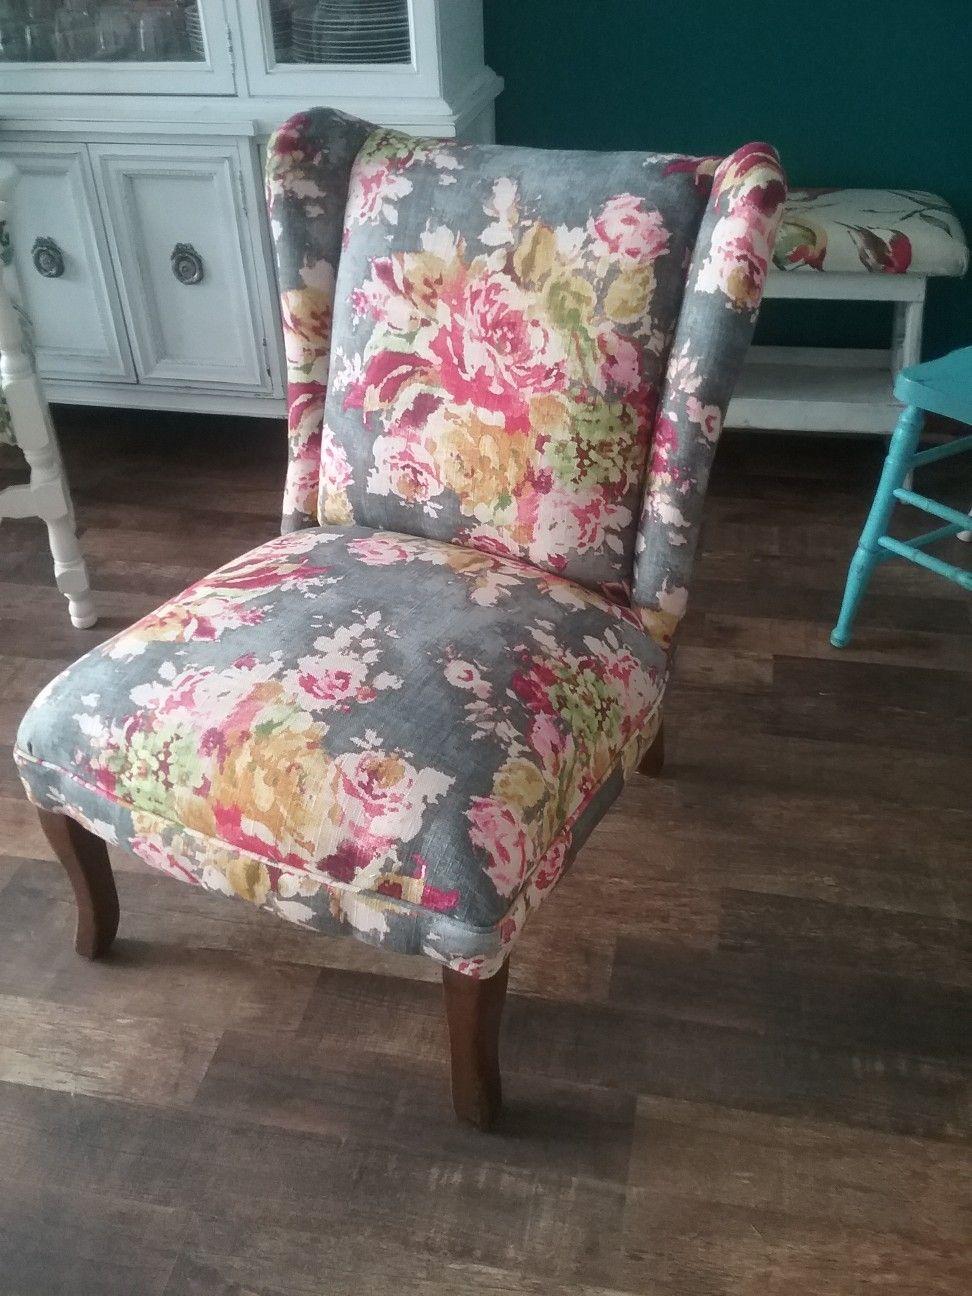 Marvelous Diy Ideas Upholstery Stain Remover Cleanses Upholstery Stain Remover Cleanses Vintage Uph Couch Upholstery Furniture Upholstery Furniture Slipcovers